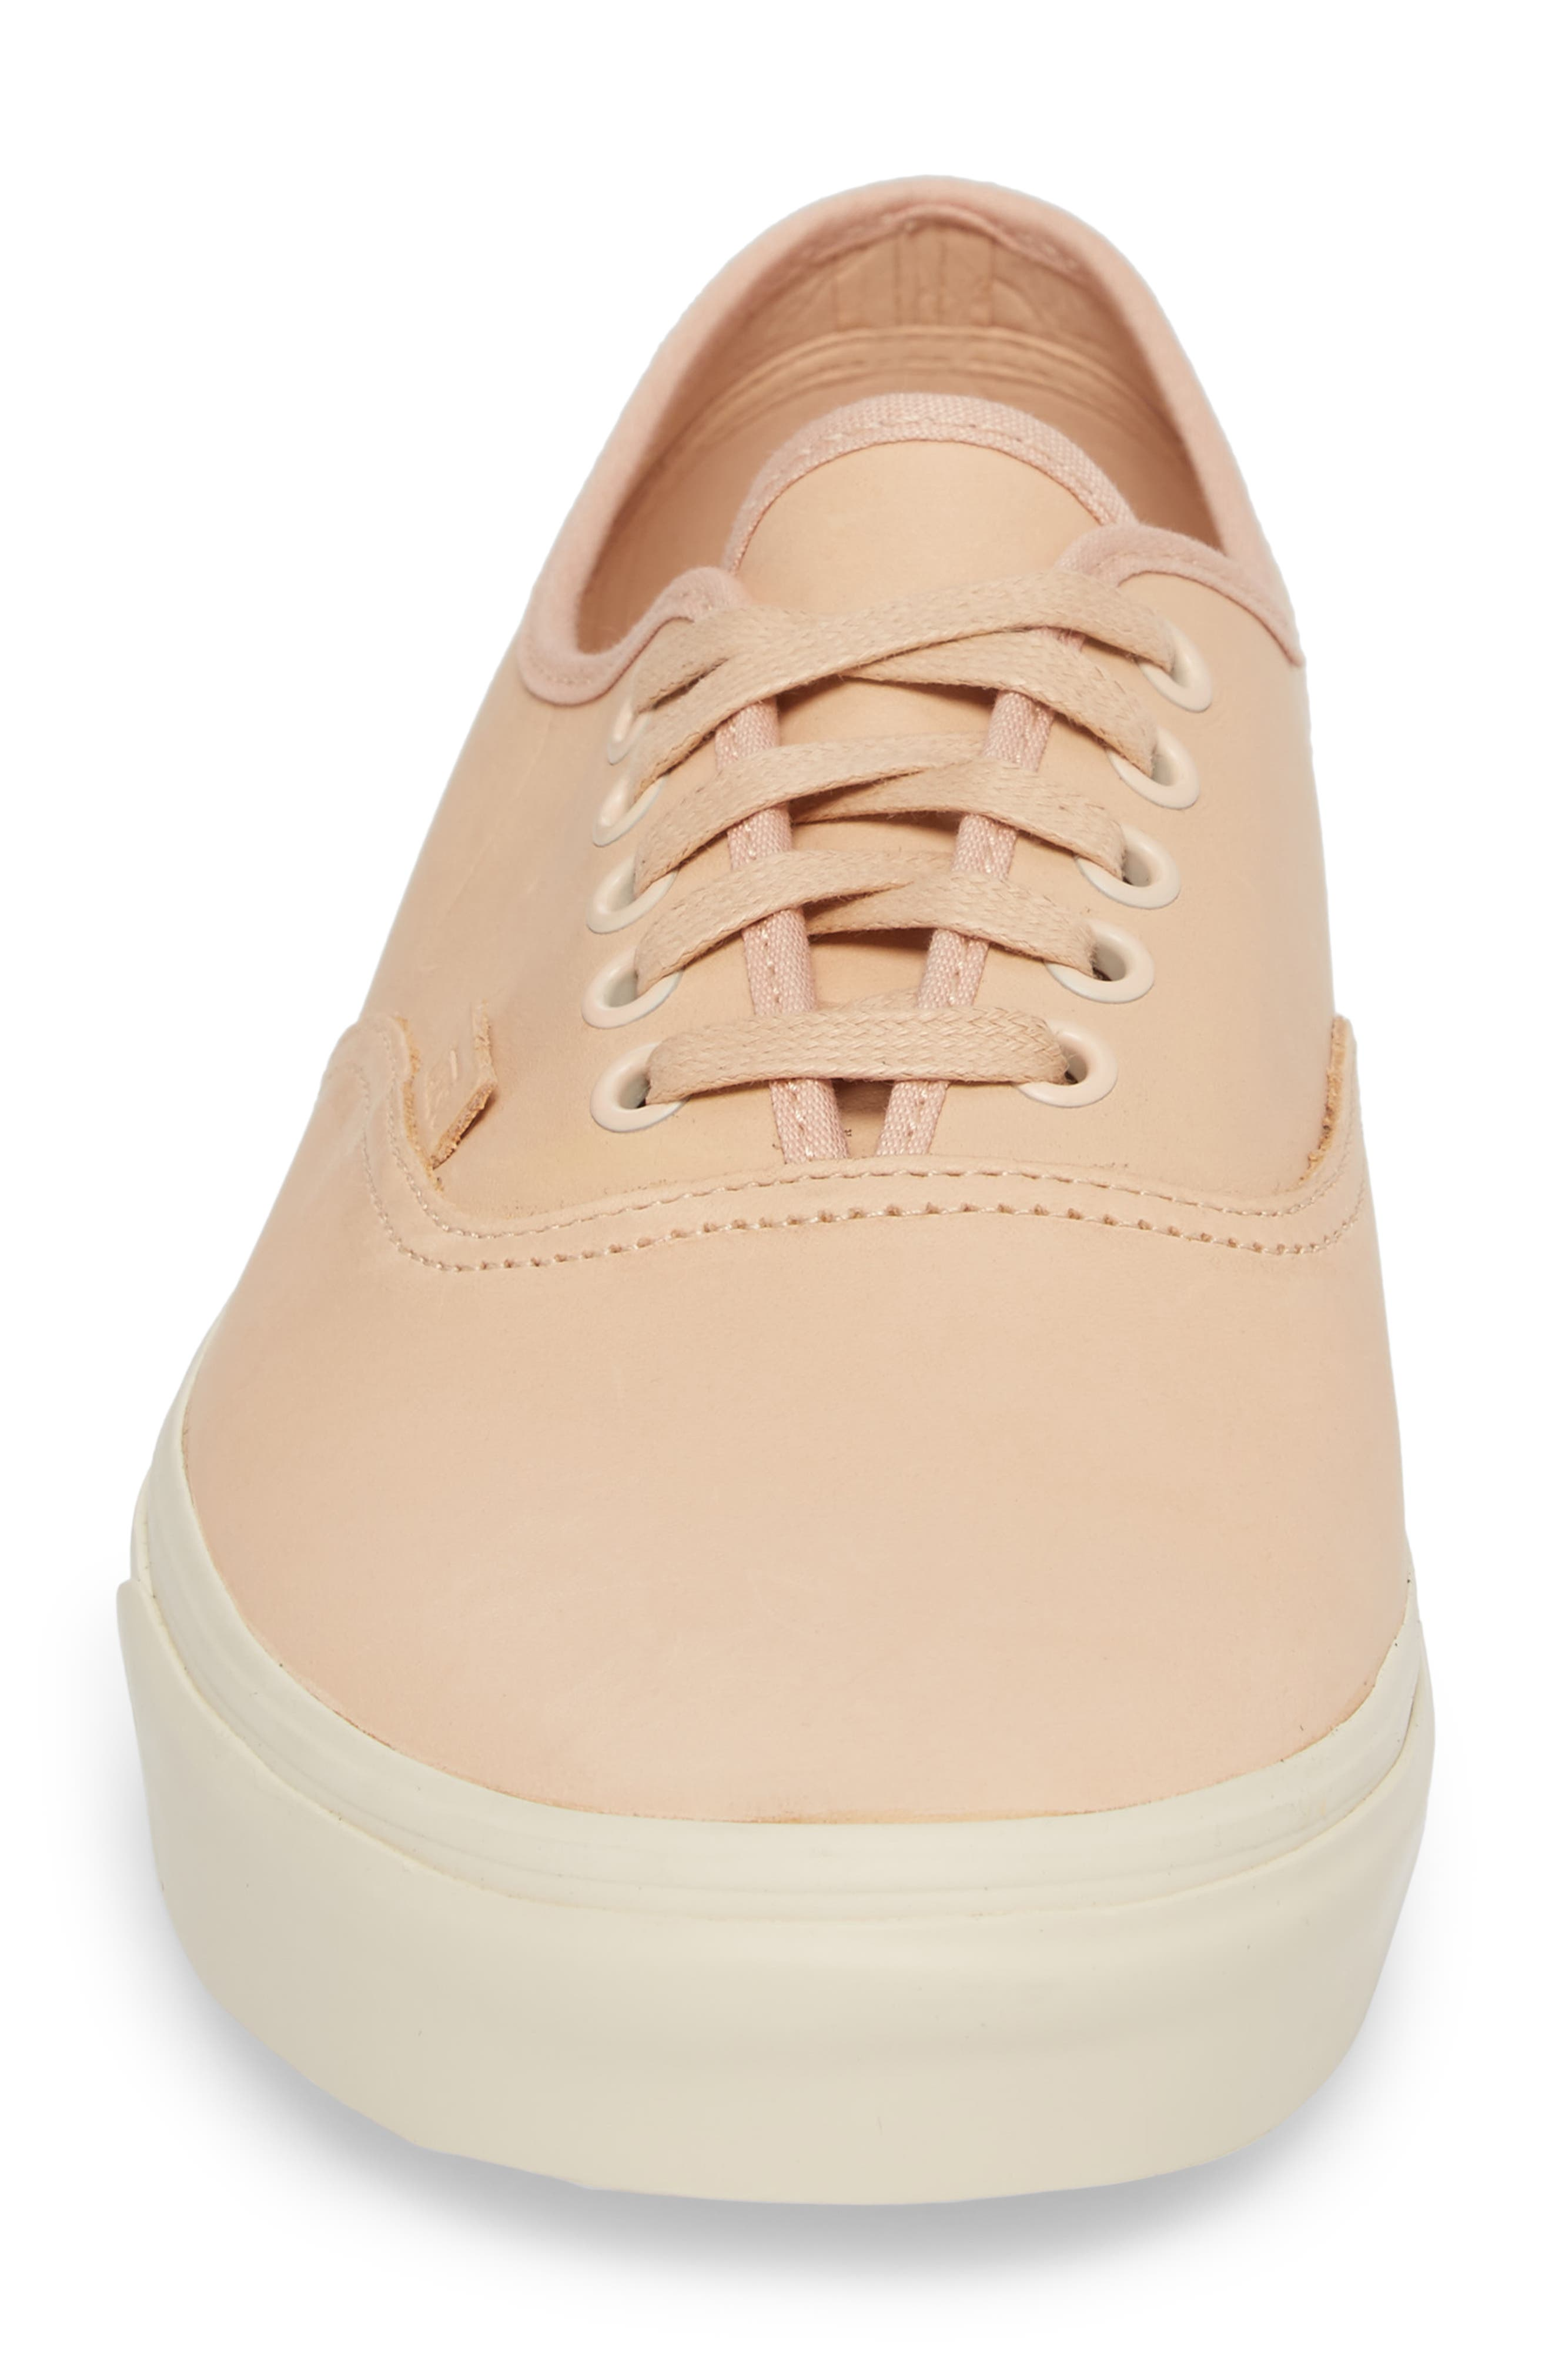 Authentic DX Sneaker,                             Alternate thumbnail 4, color,                             Veggie Tan Leather